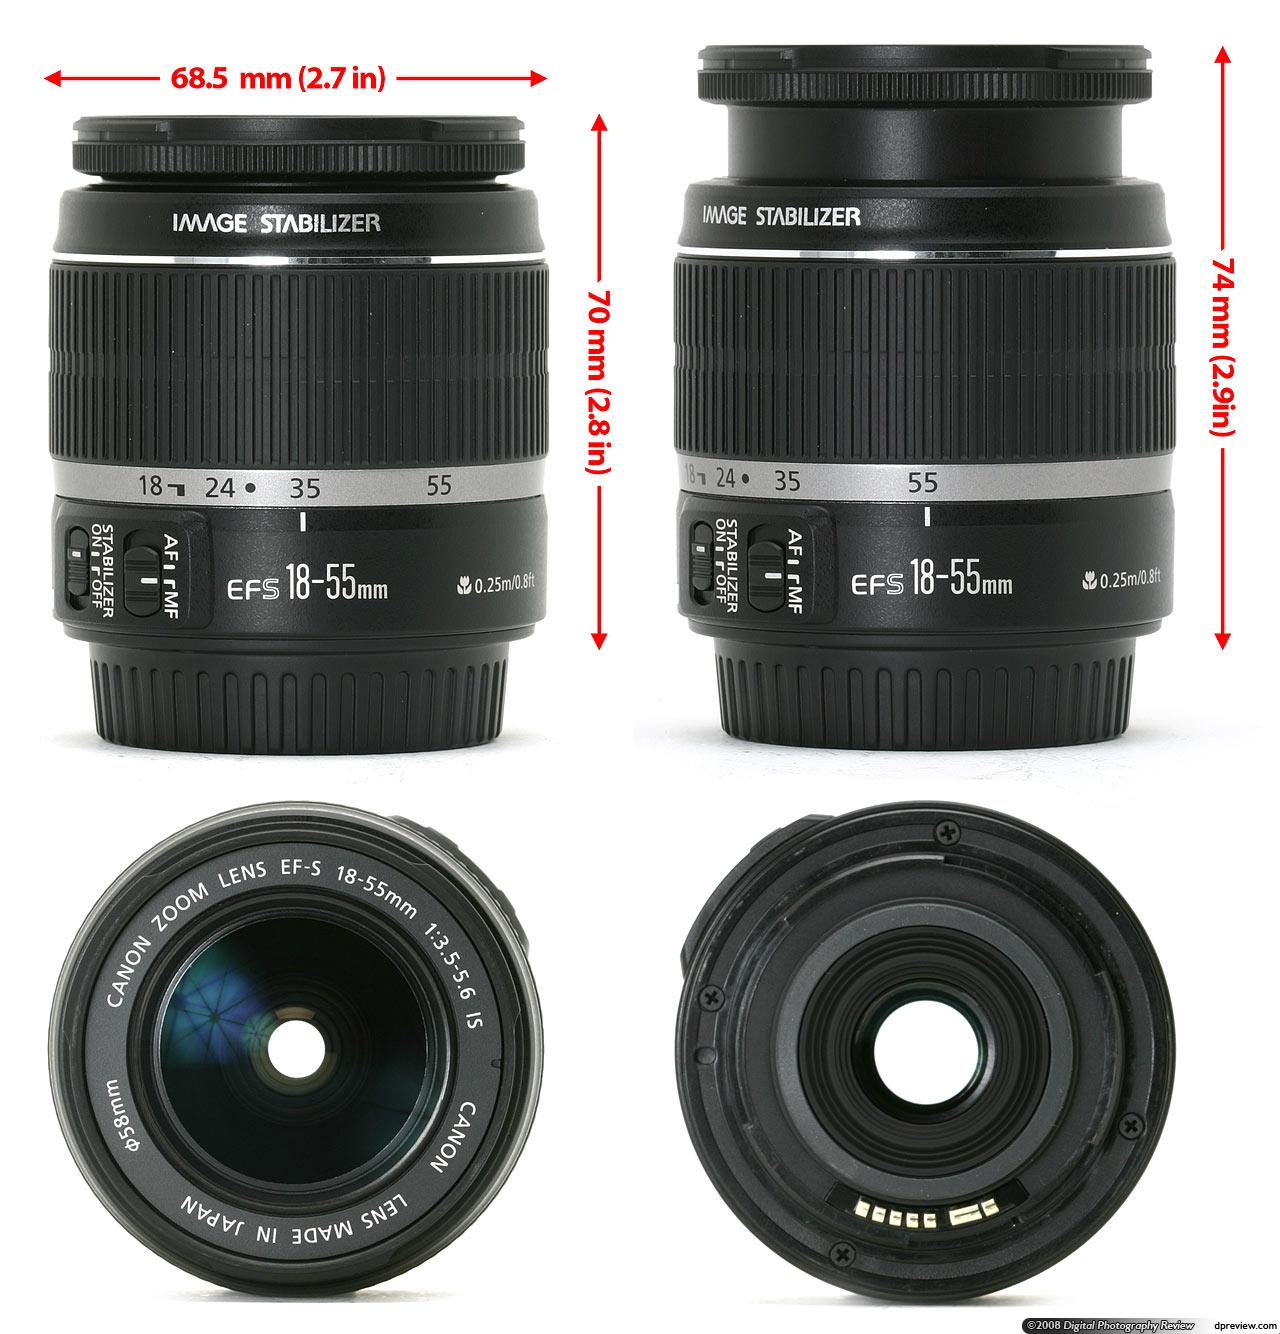 digital 35mm slr camera with manual capabilities